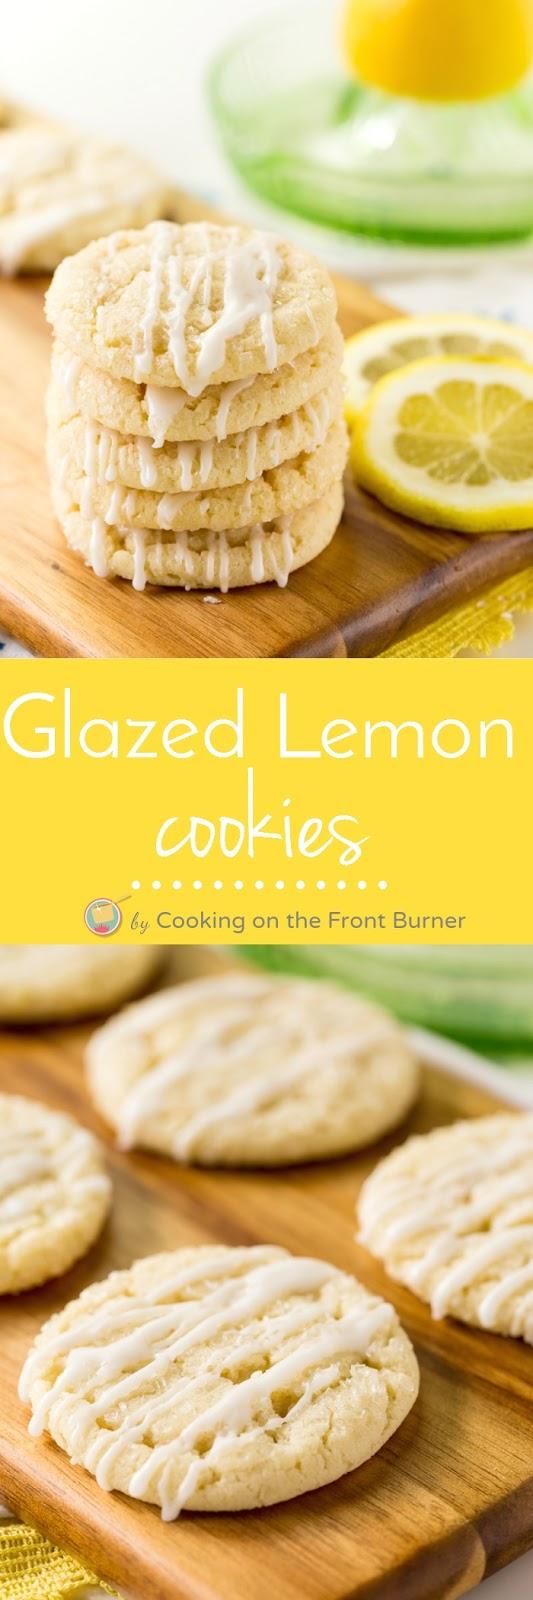 Glazed Lemon Cookies   Cooking on the Front Burner